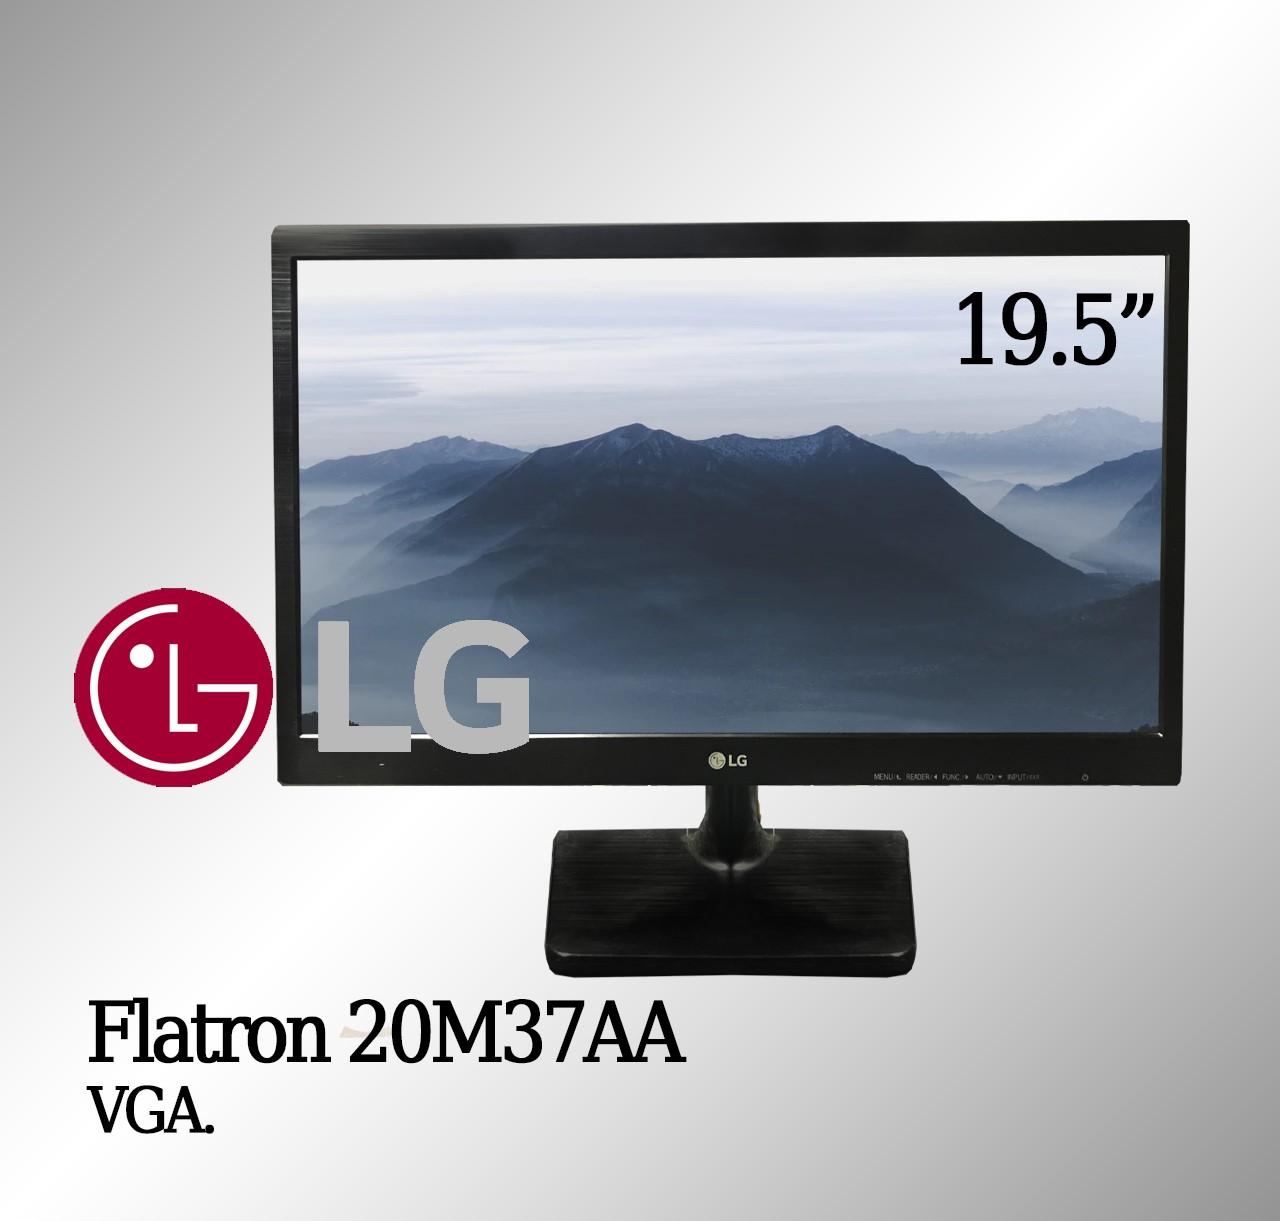 Monitor LG Flatron 20M37AA